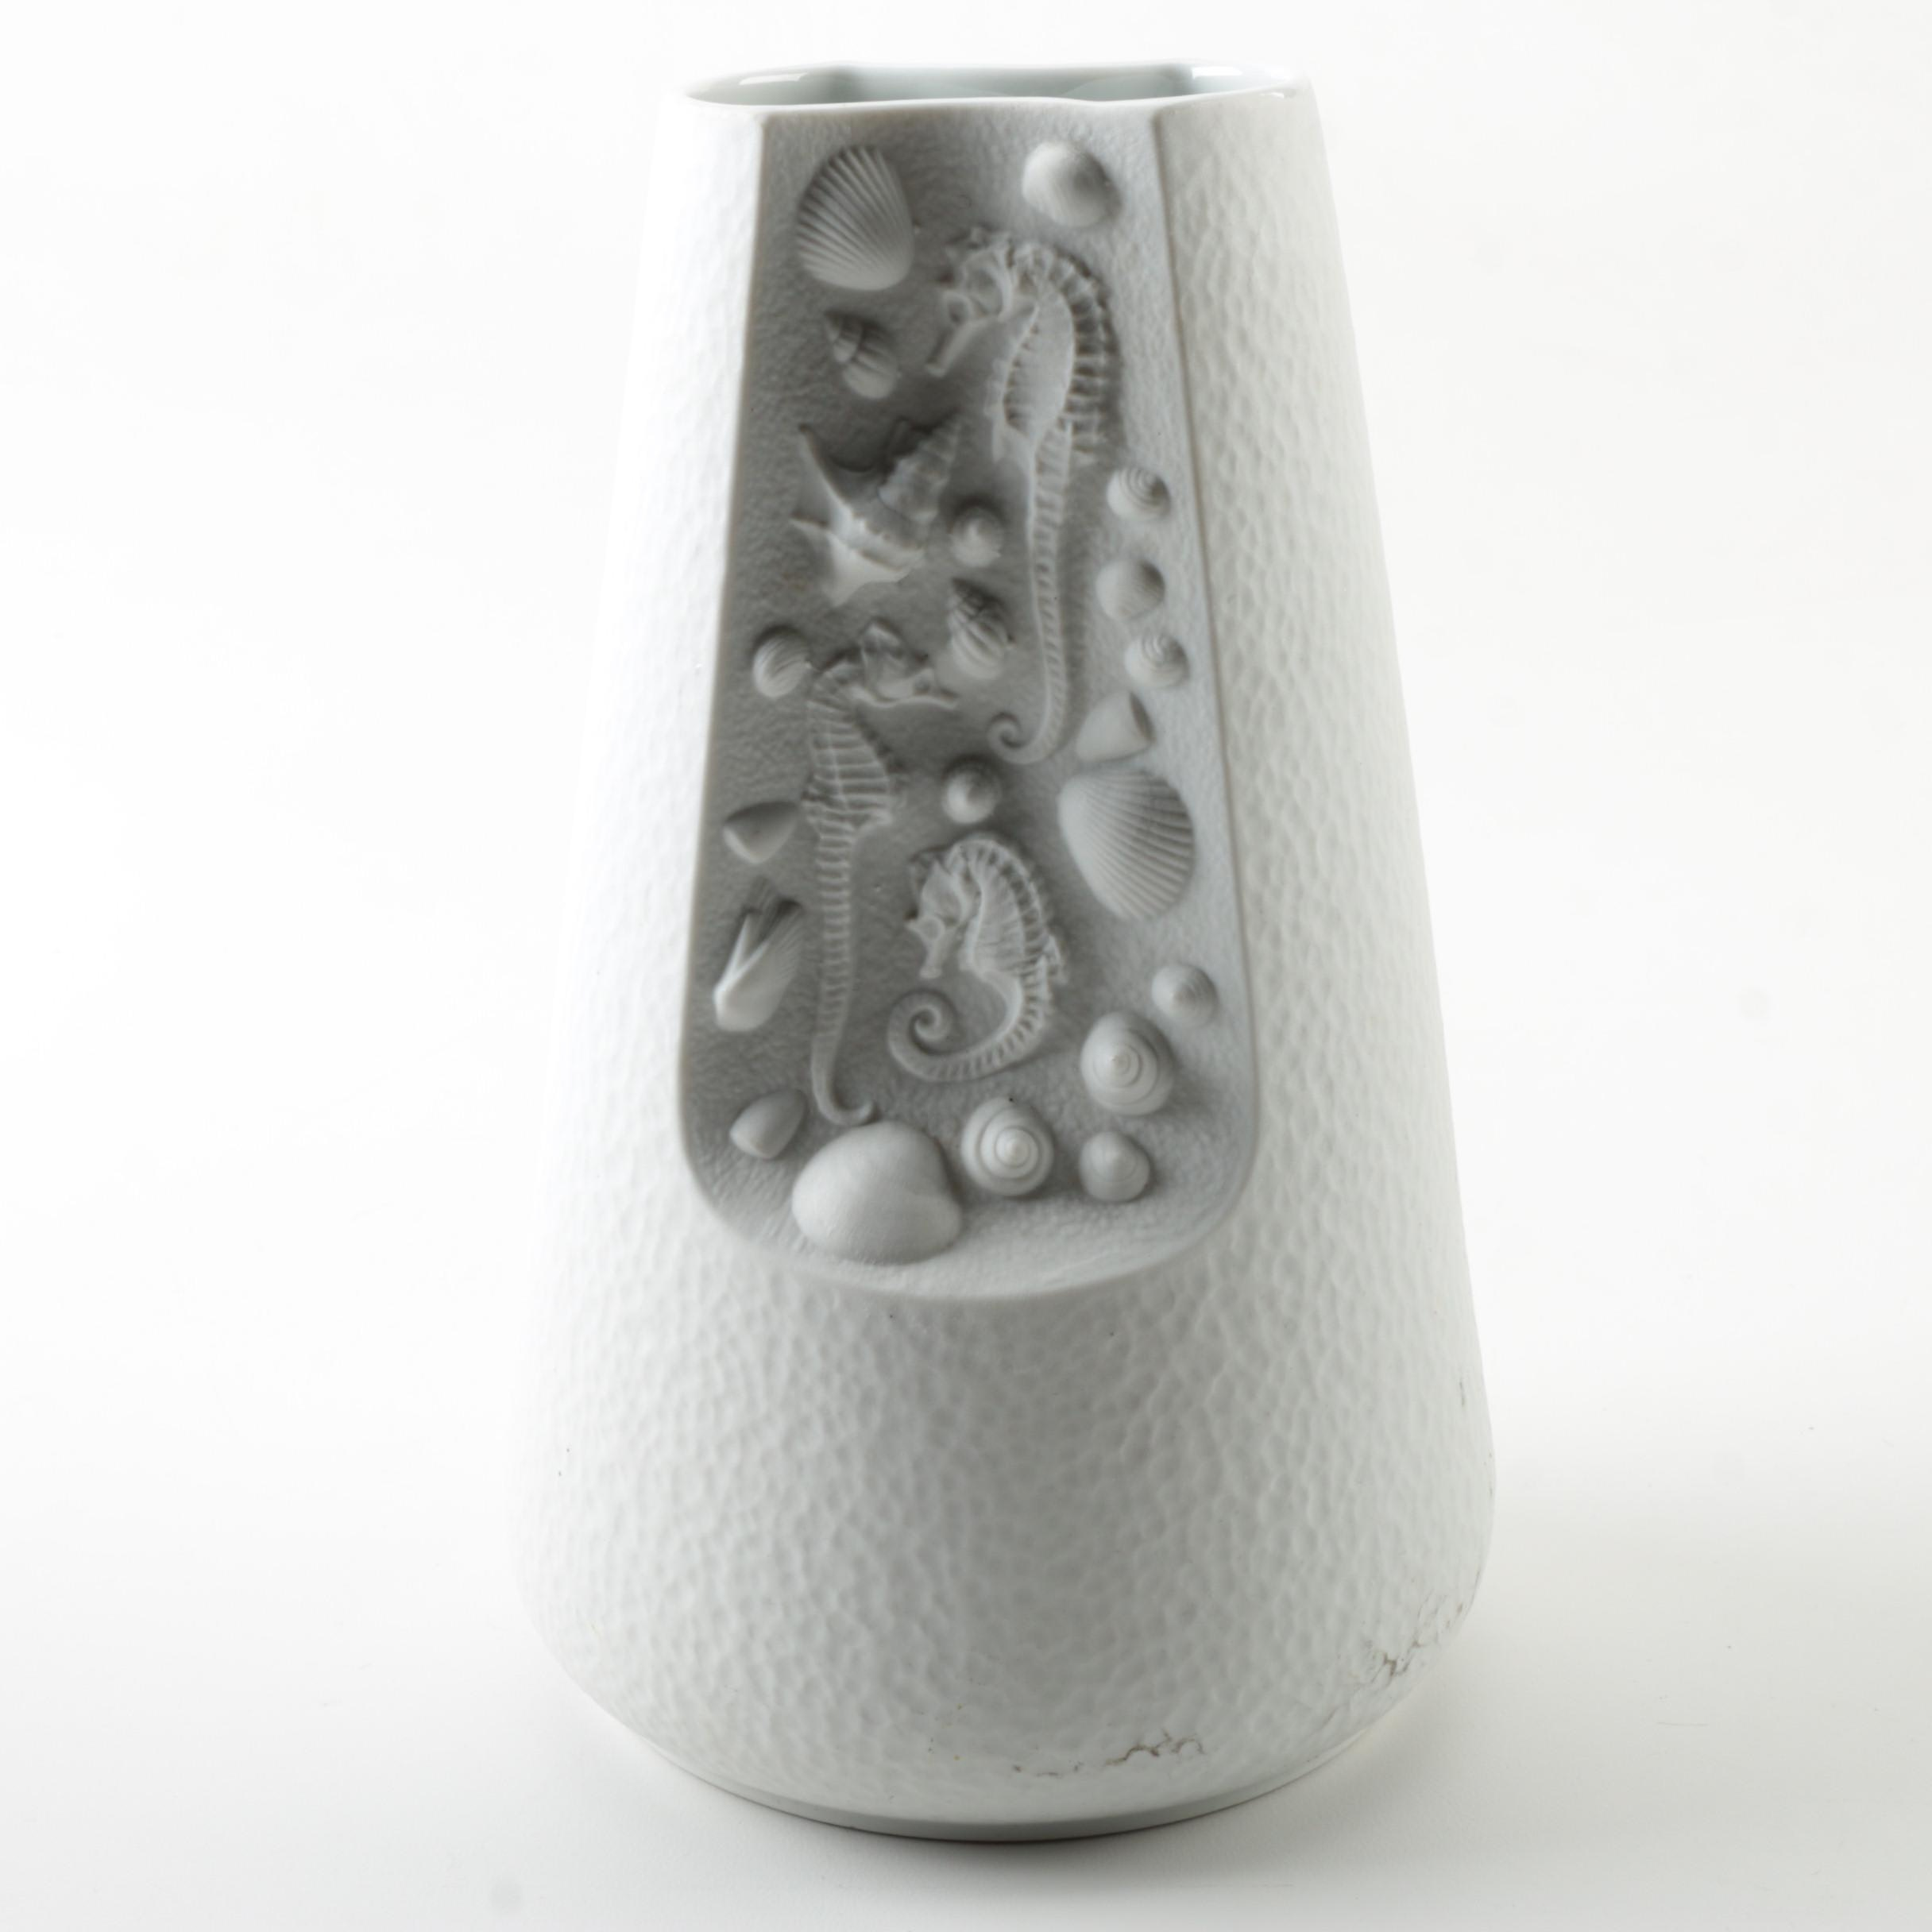 Bareuther Bisque Porcelain Vase with Ocean Motif